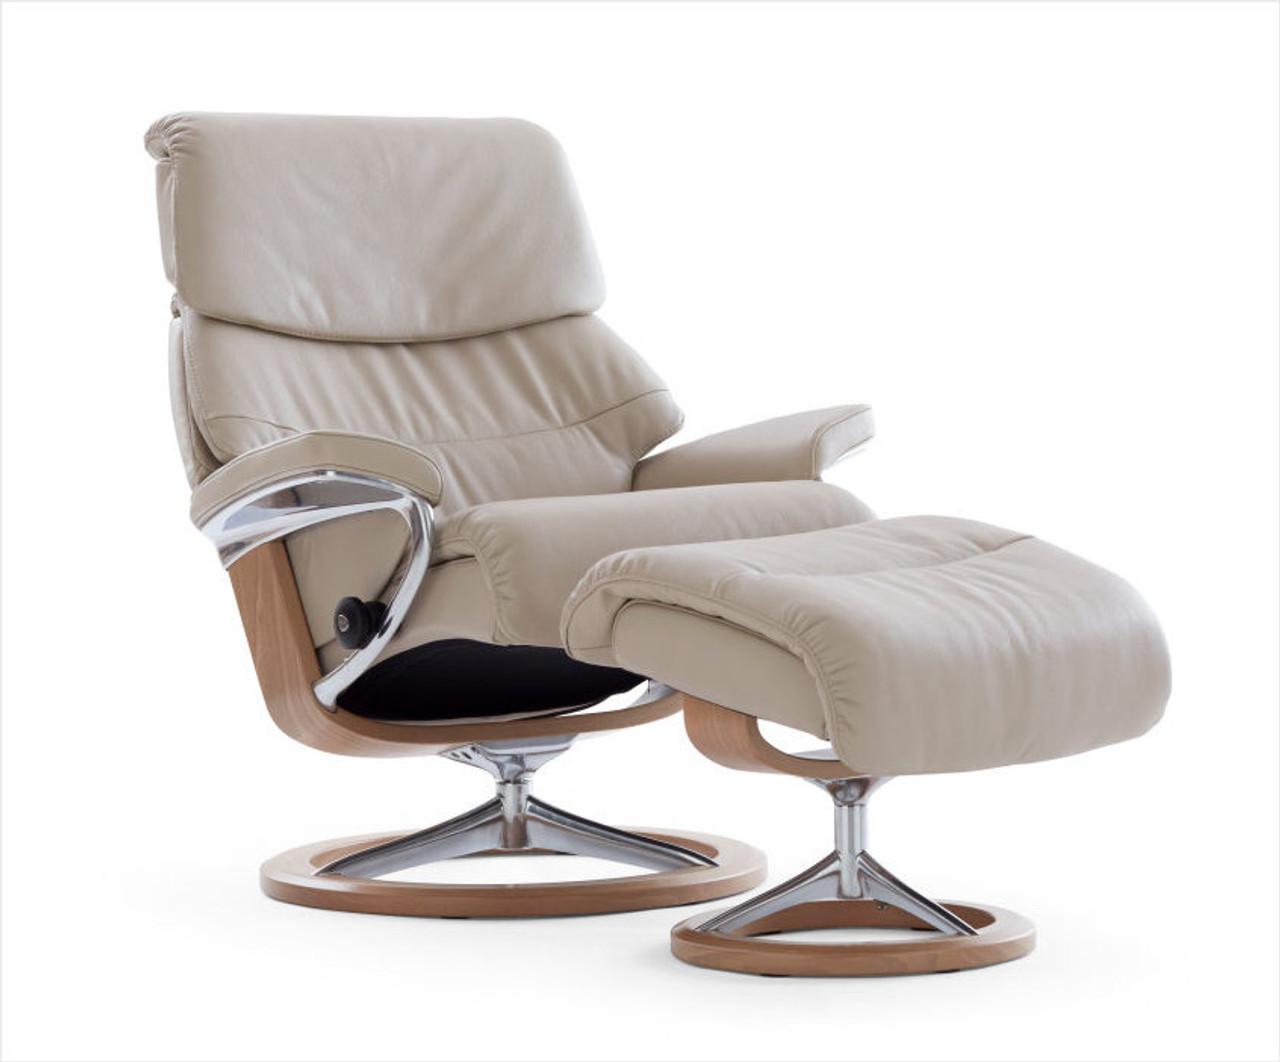 Stressless Capri Chair Signature Or Legcomfort Series Unwind Com